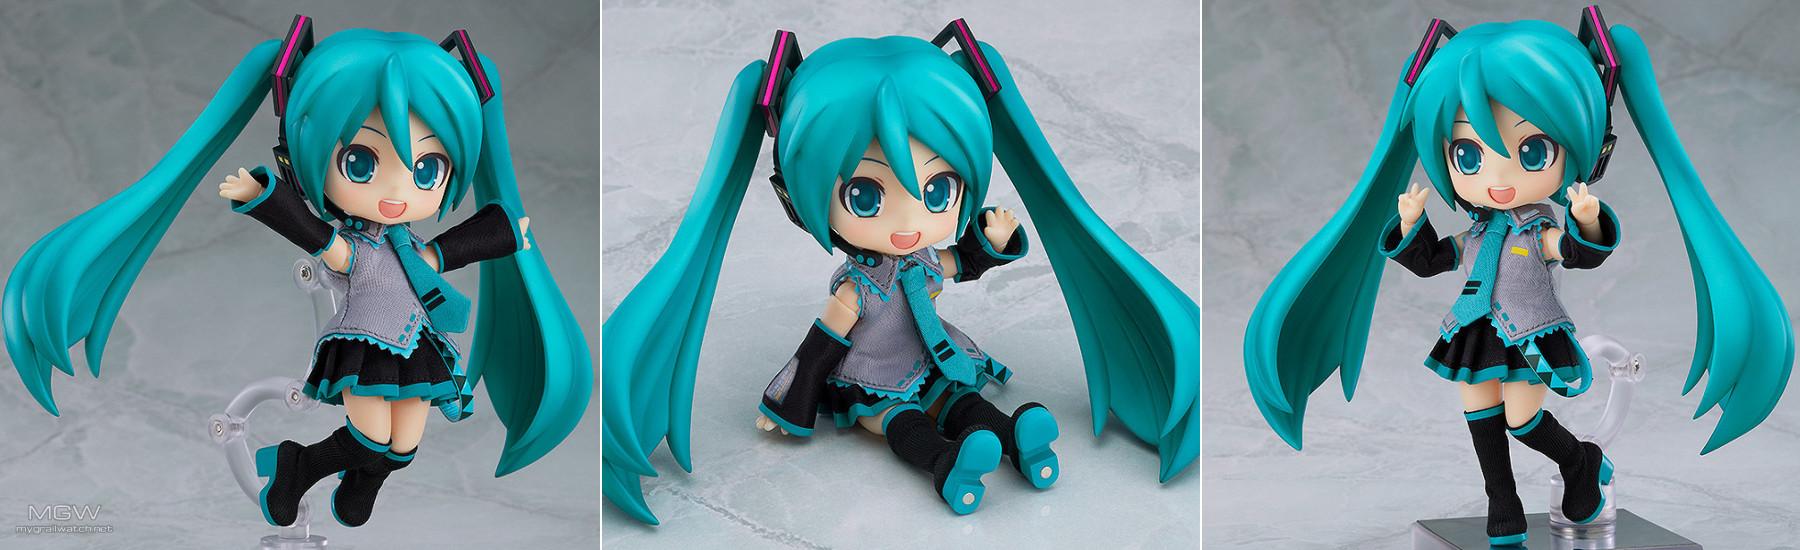 Nendoroid Doll Hatsune Miku by Good Smile Company